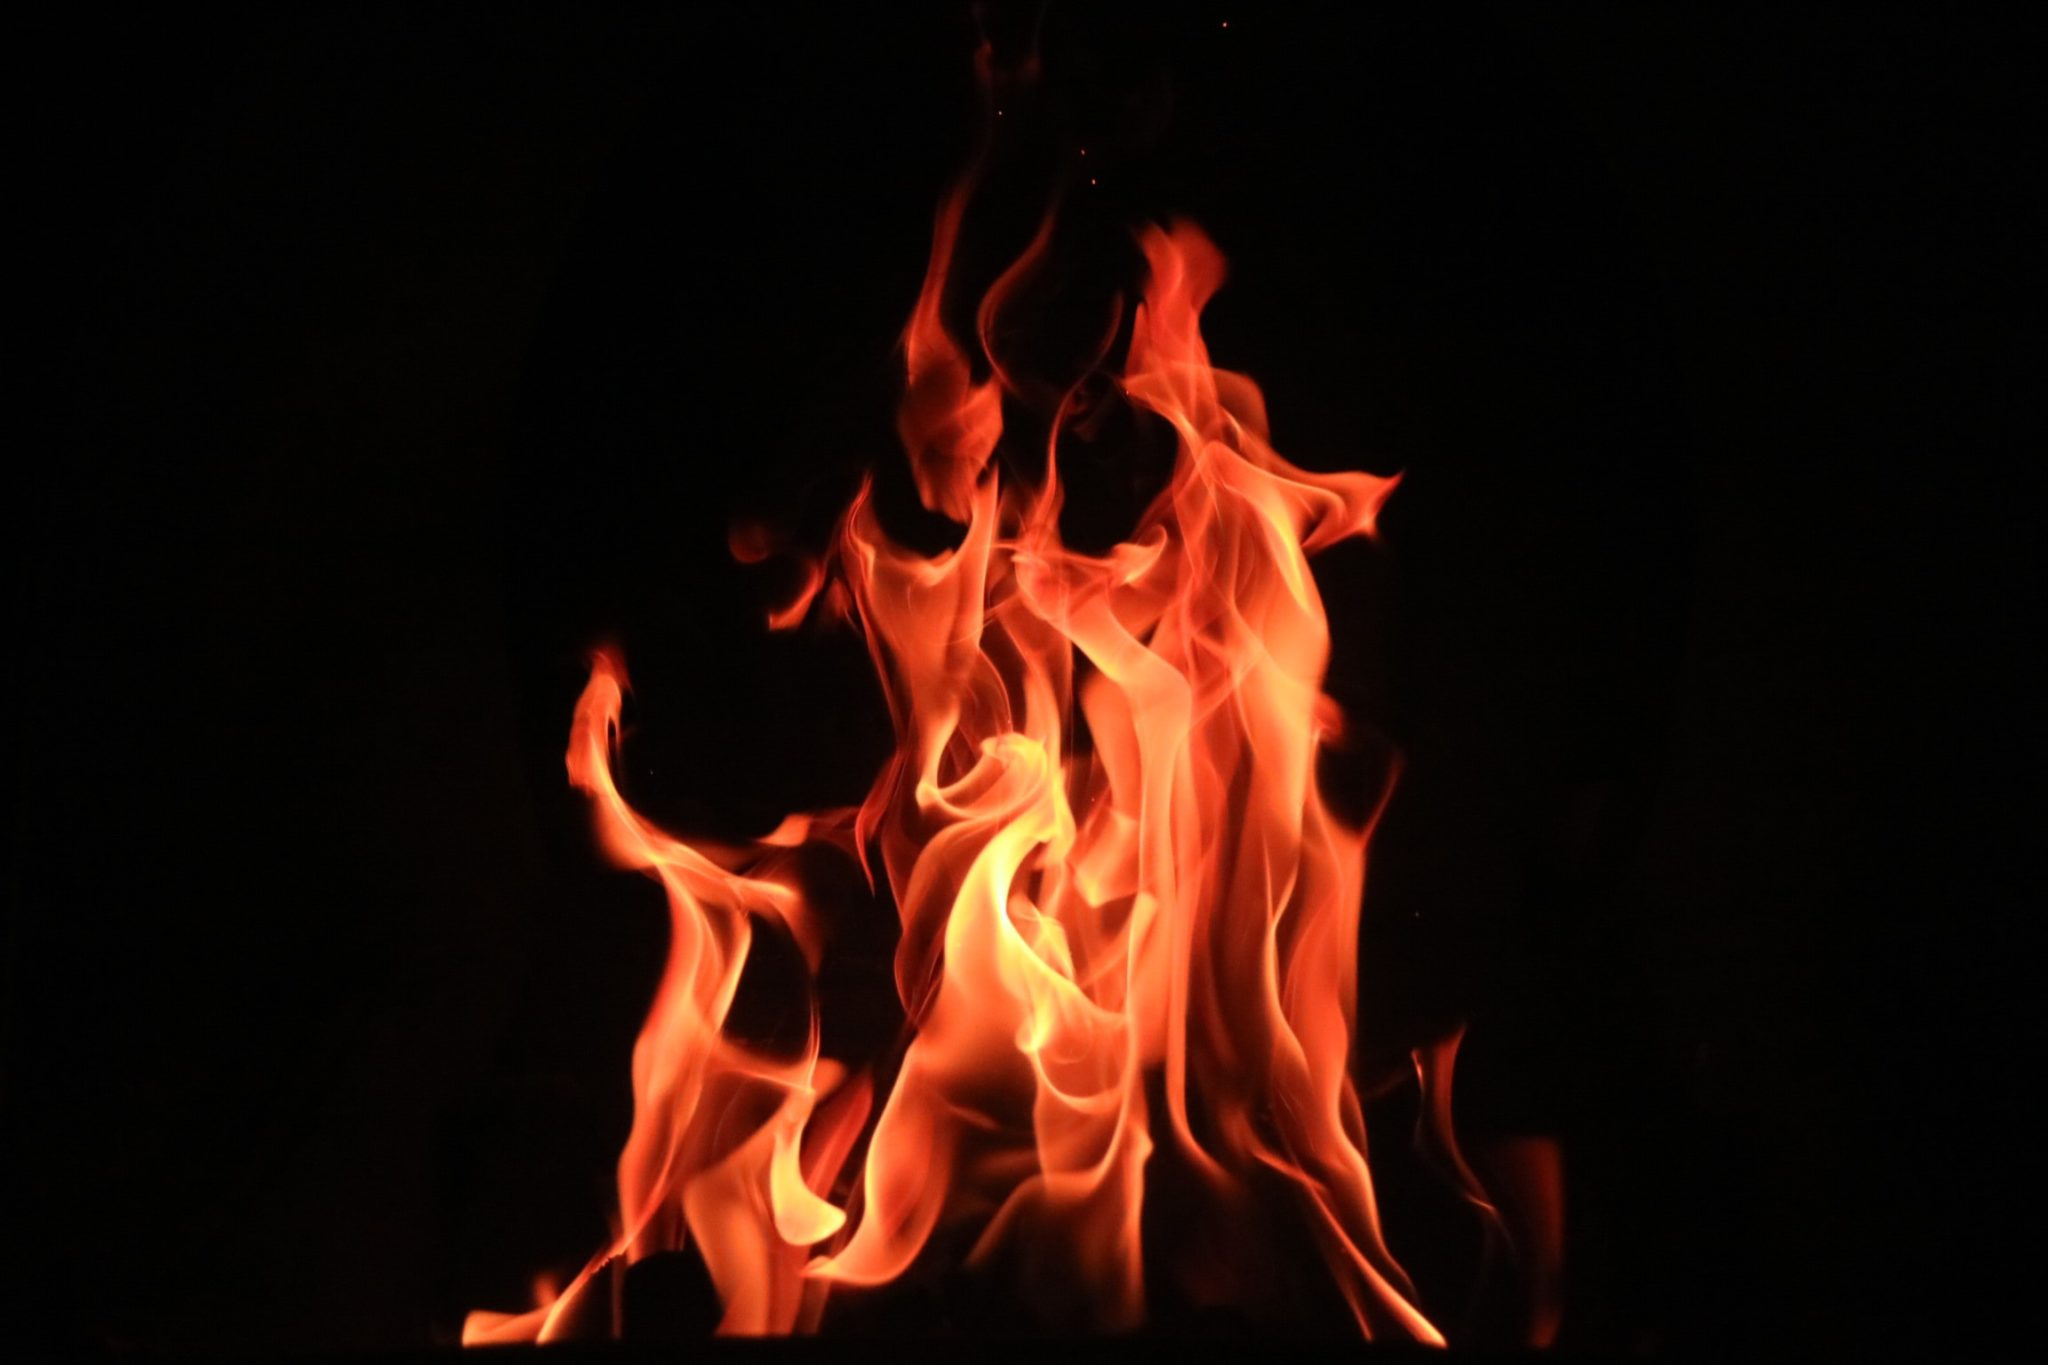 Pentecost Sunday Prayer and Liturgy Ideas